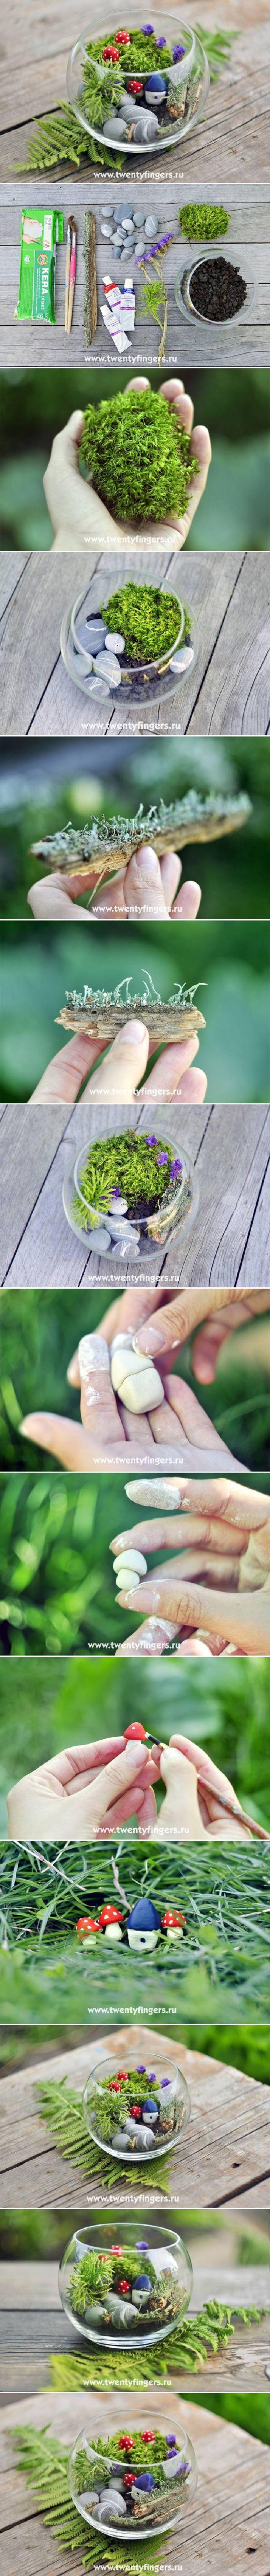 best miniatures images on pinterest dollhouse miniatures